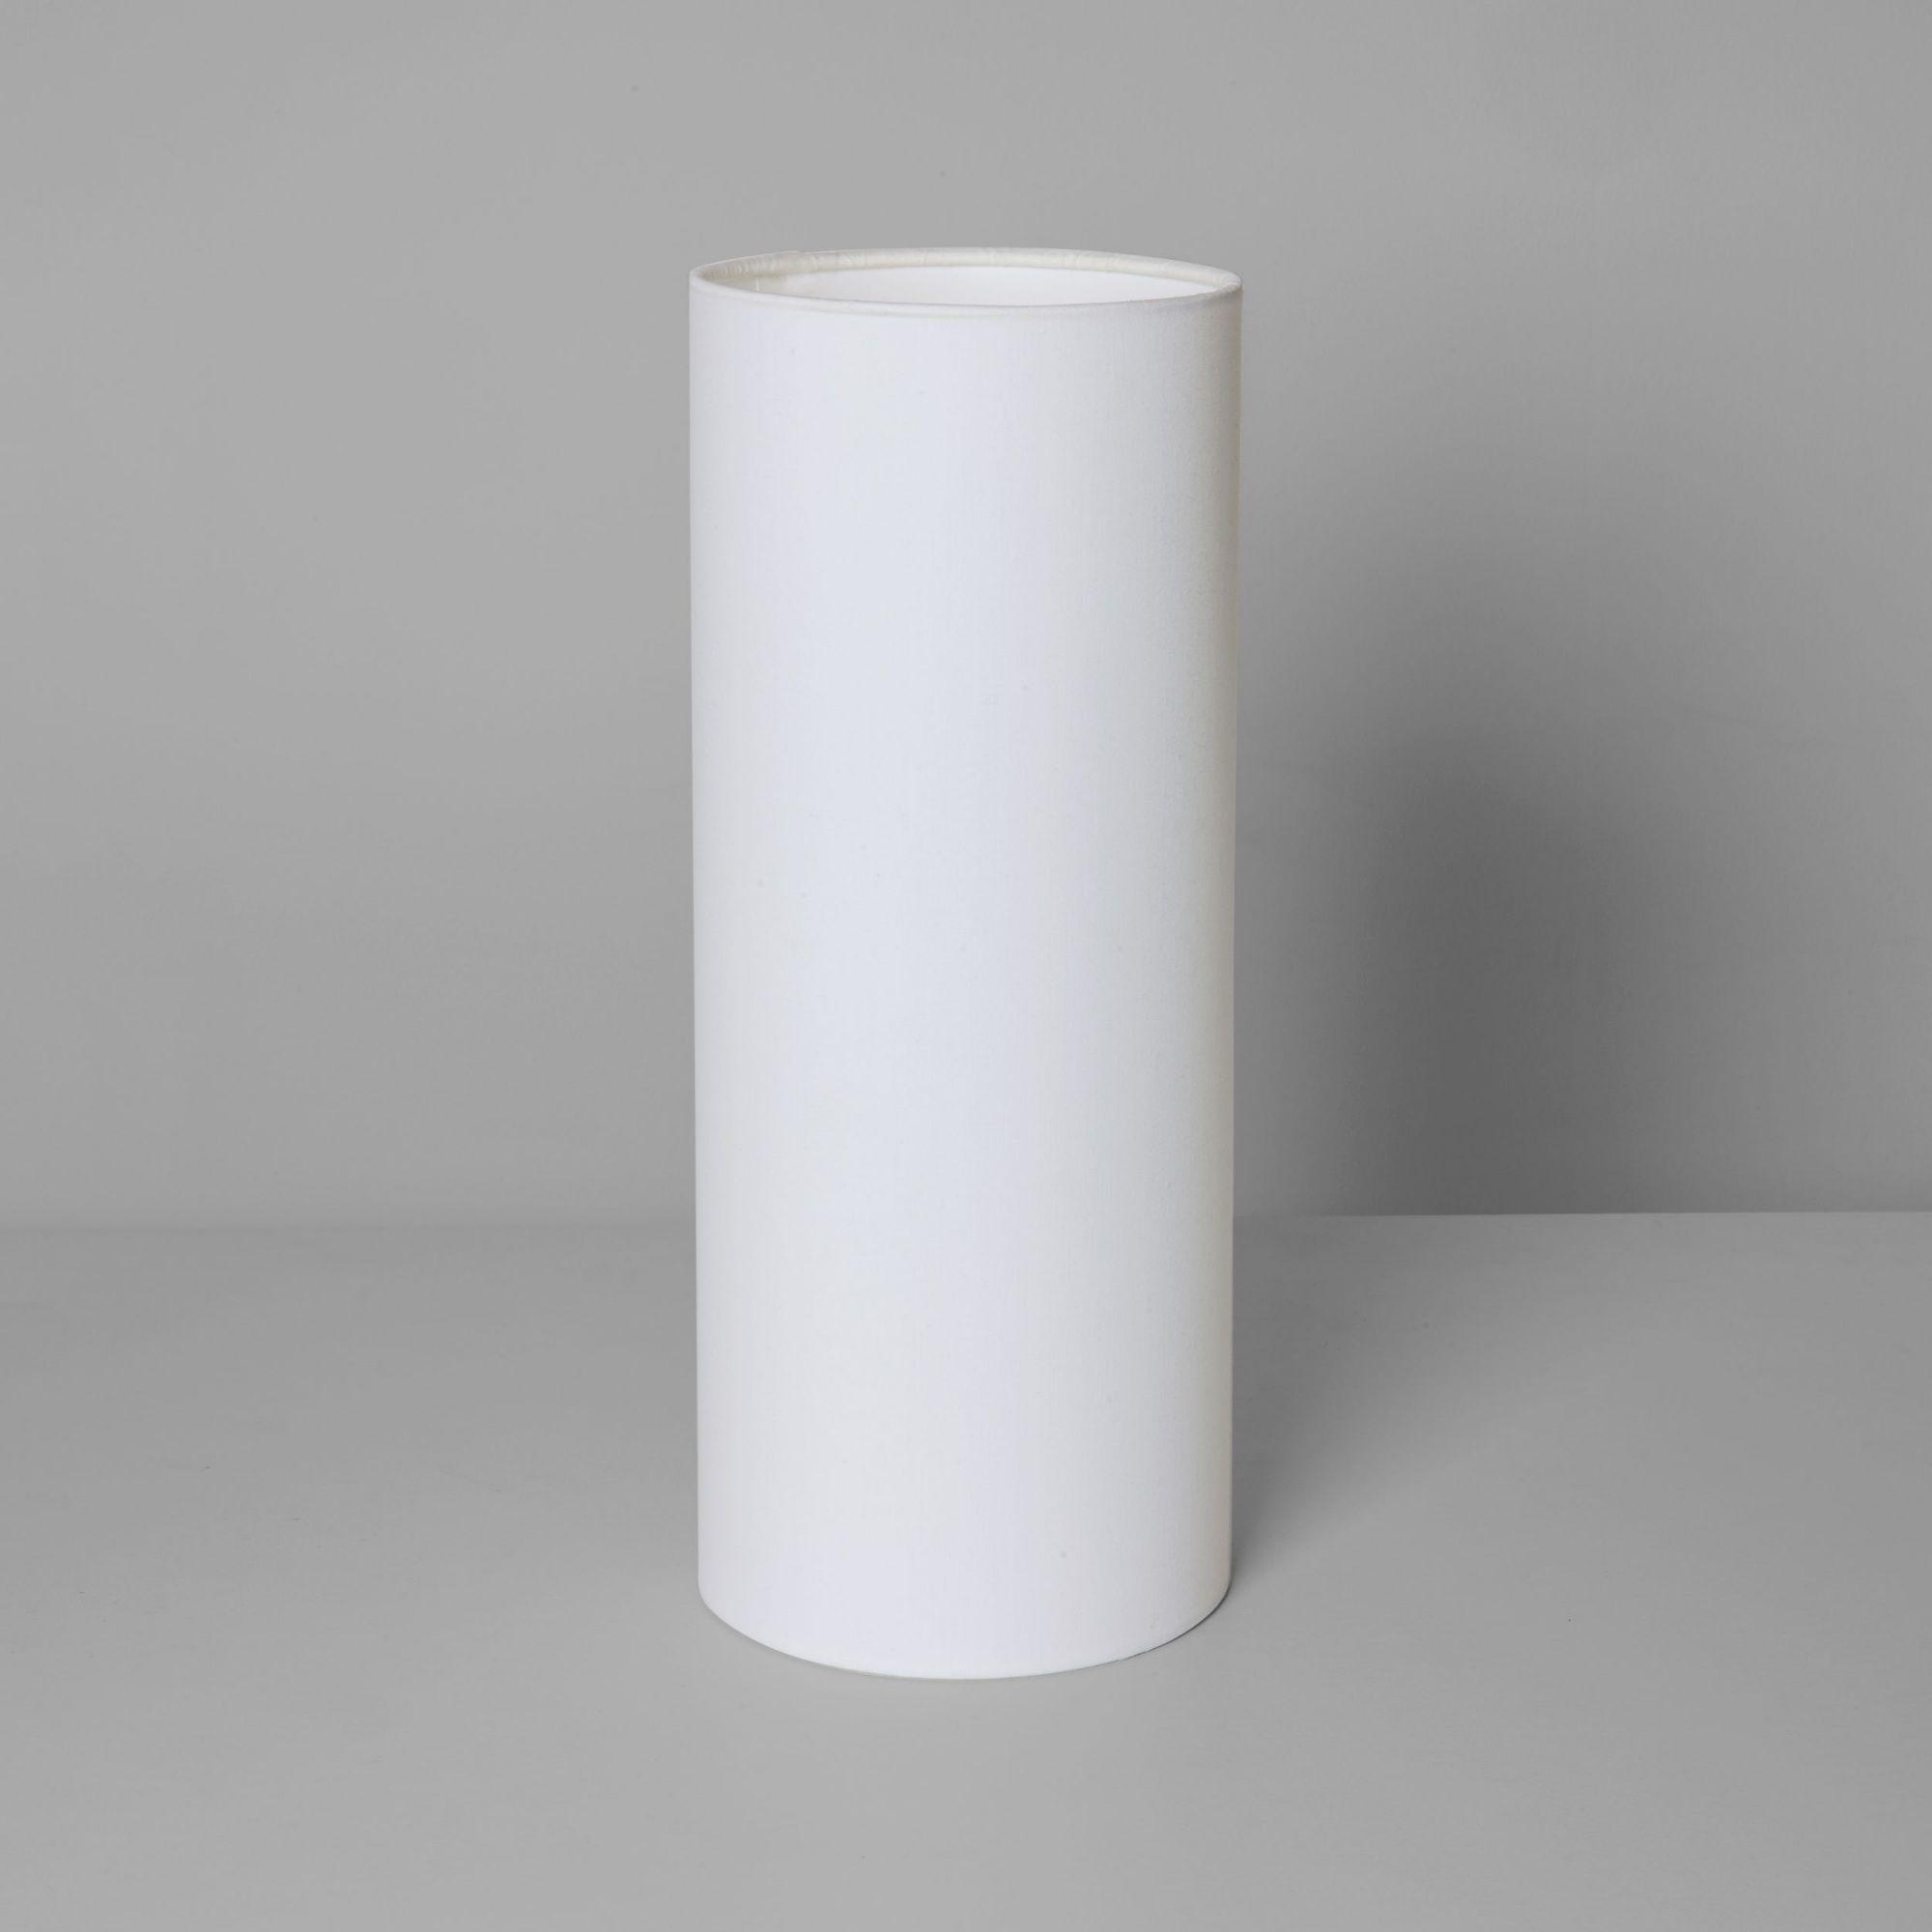 Abażur Tube 135 4177 Biały Astro Lighting